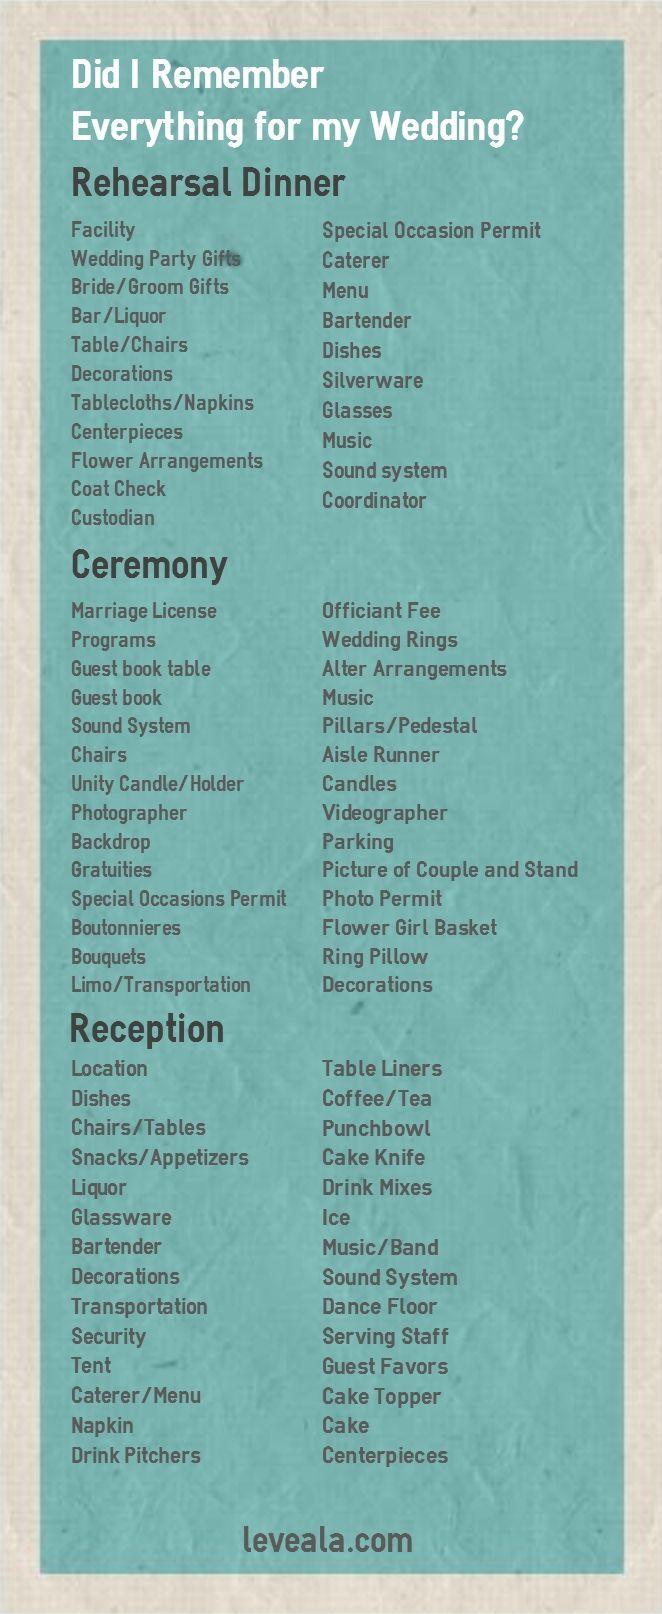 did i remember everything for my wedding wedding checklist